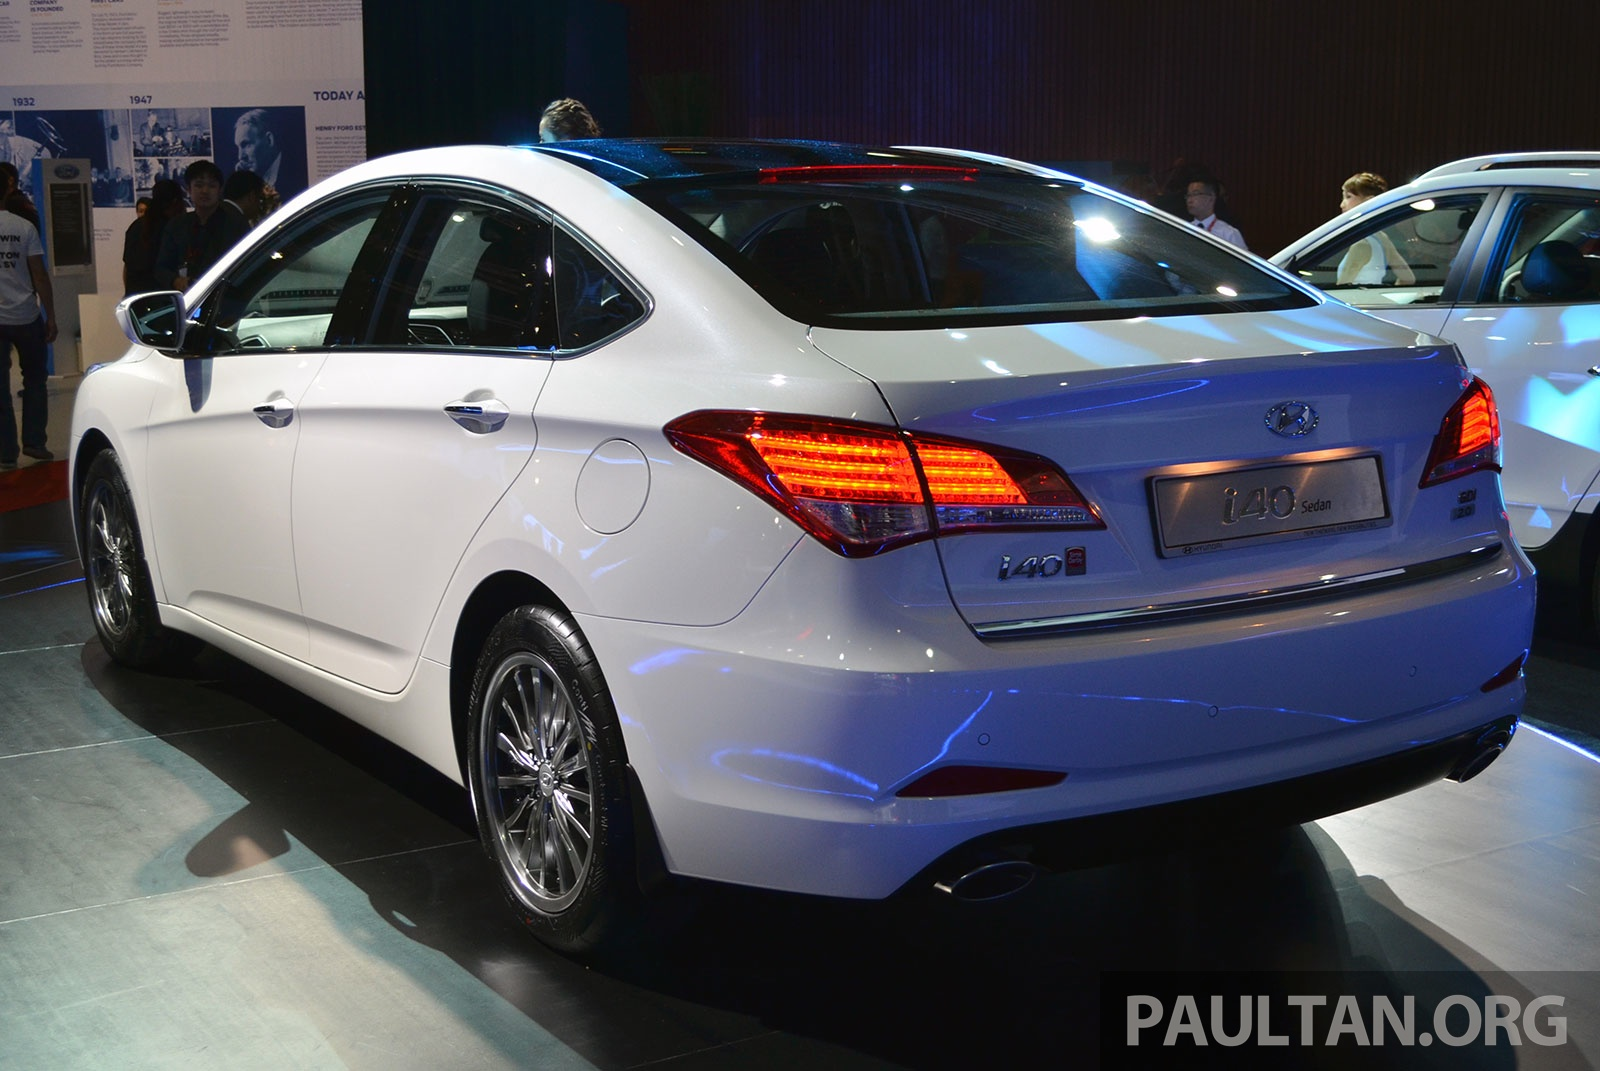 Hyundai i40 Sedan and Tourer launched in Malaysia - 2.0 GDI